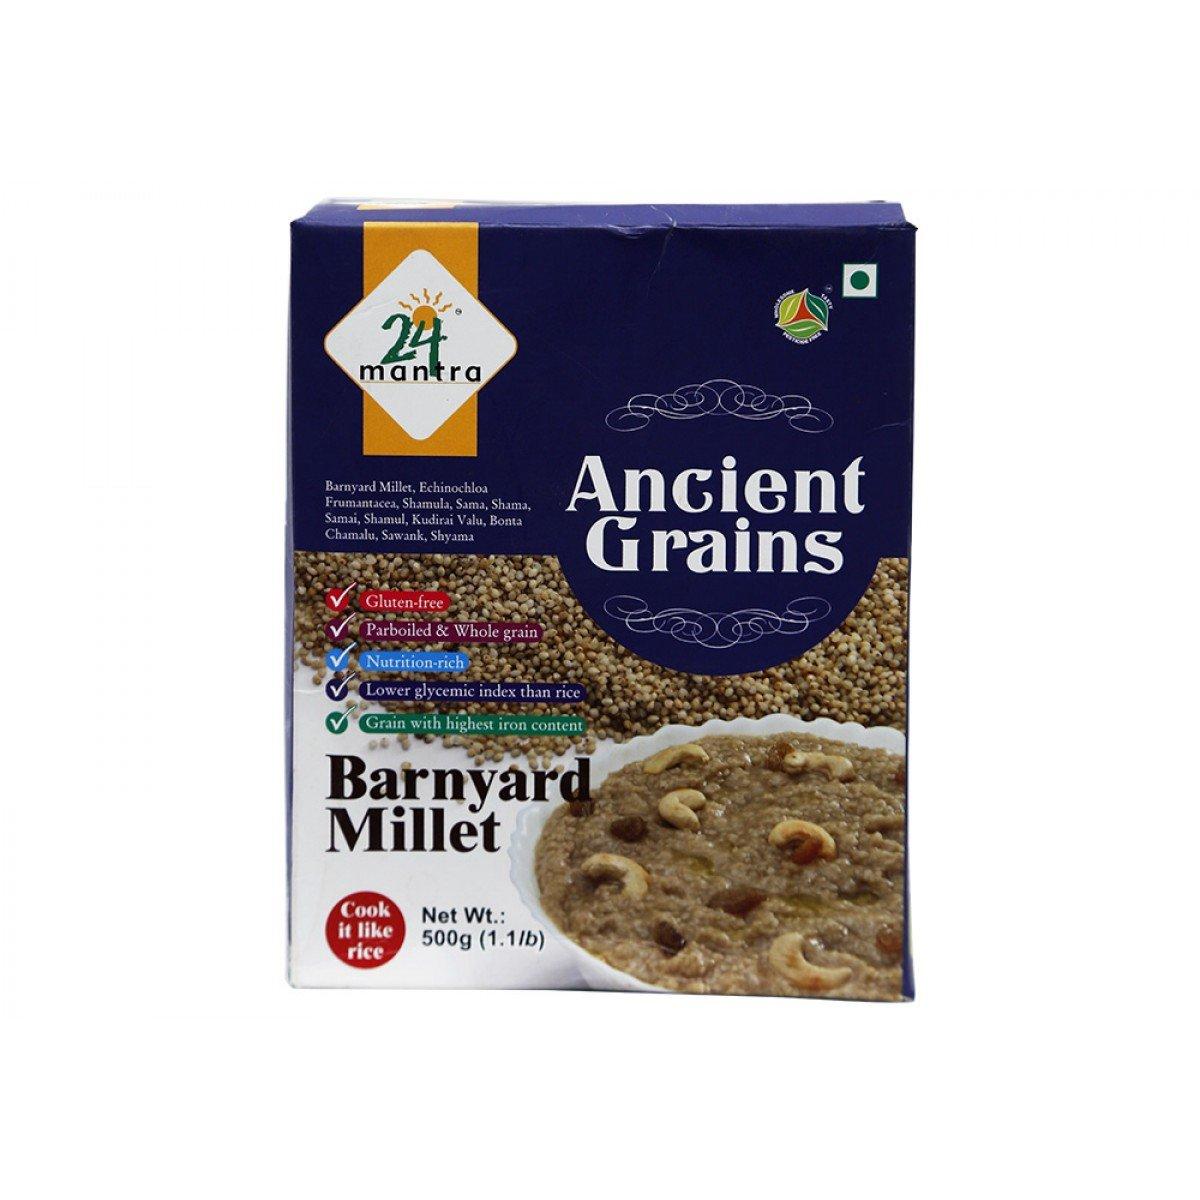 24 Mantra Organic Parboiled Barnyard Millet - 500 Gms - 2 Pack